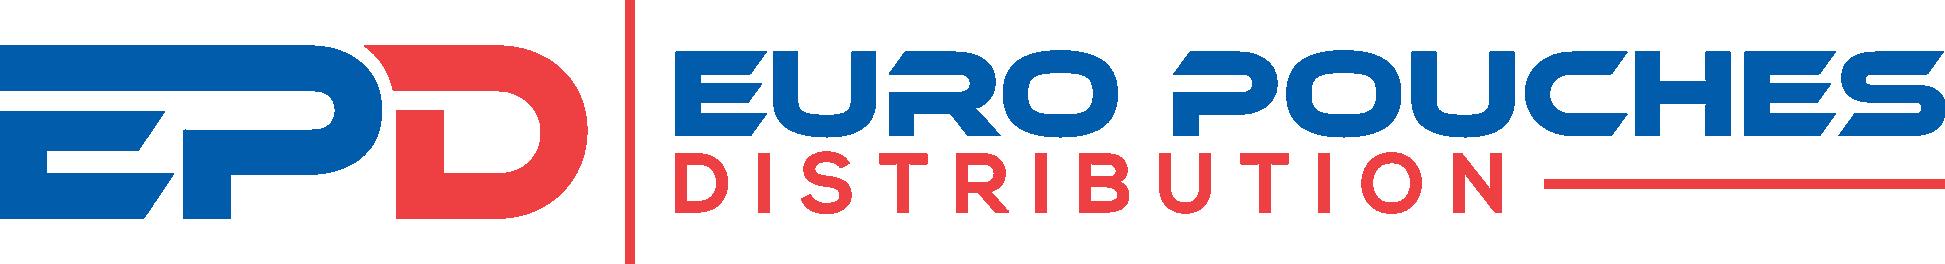 Europouches.com